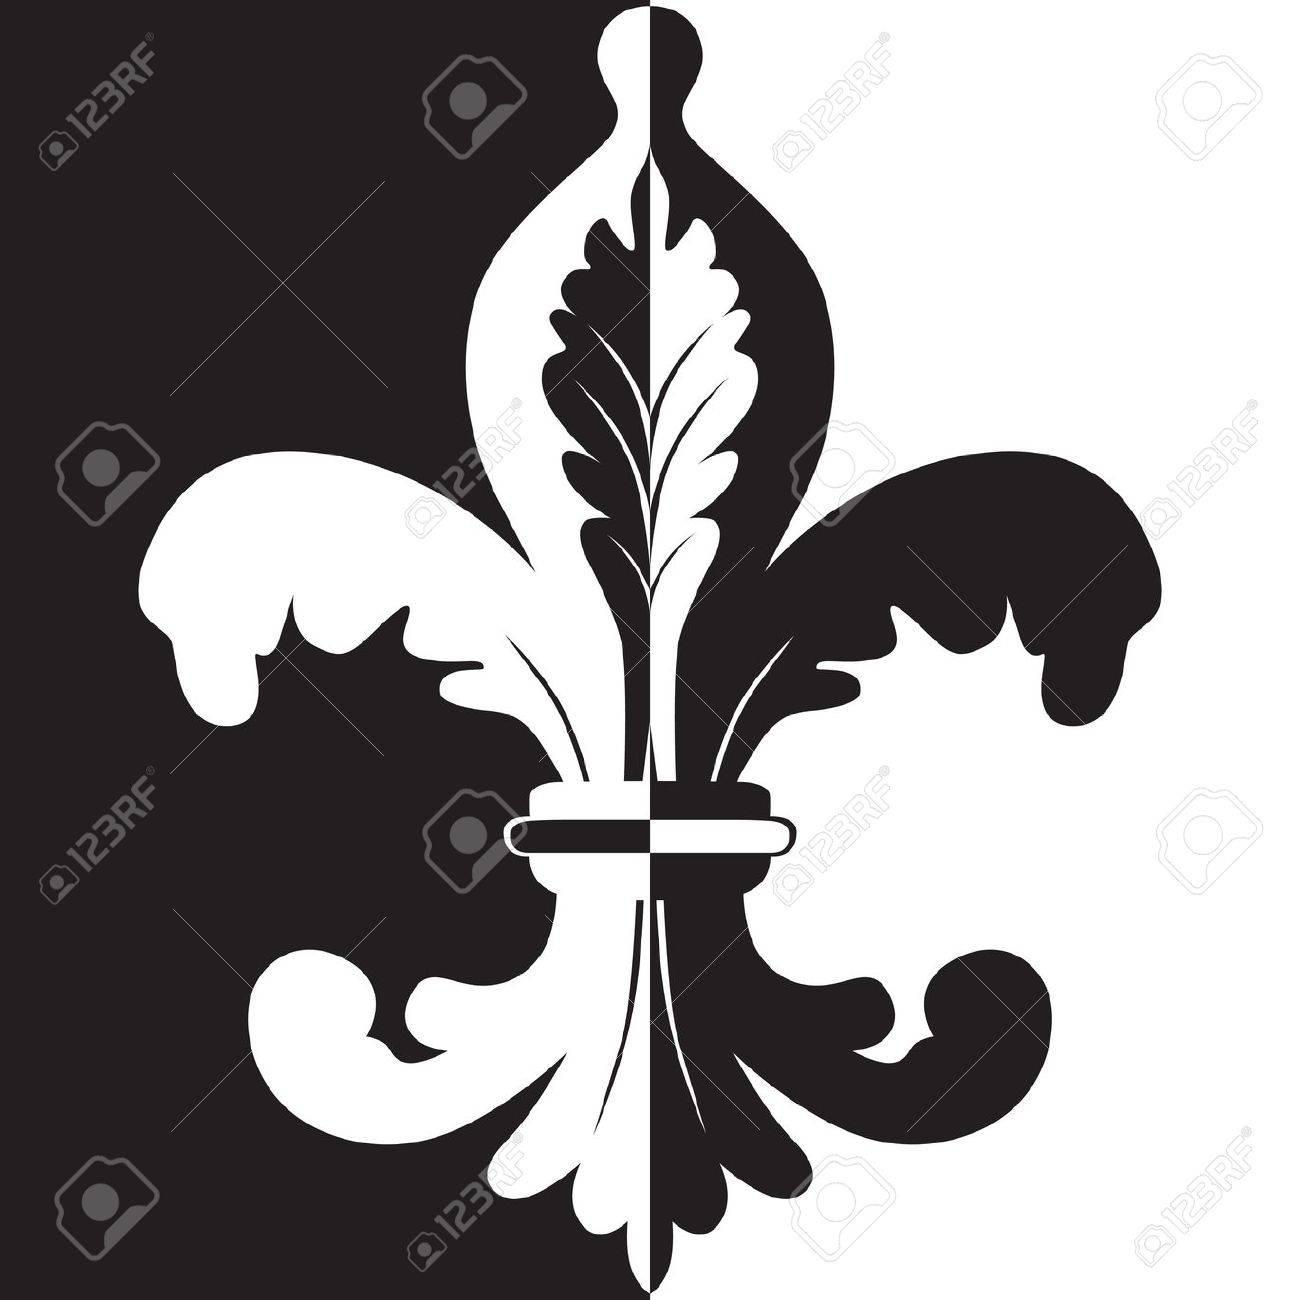 Black And White Illustration Of Fleur De Lis Royalty Free Cliparts